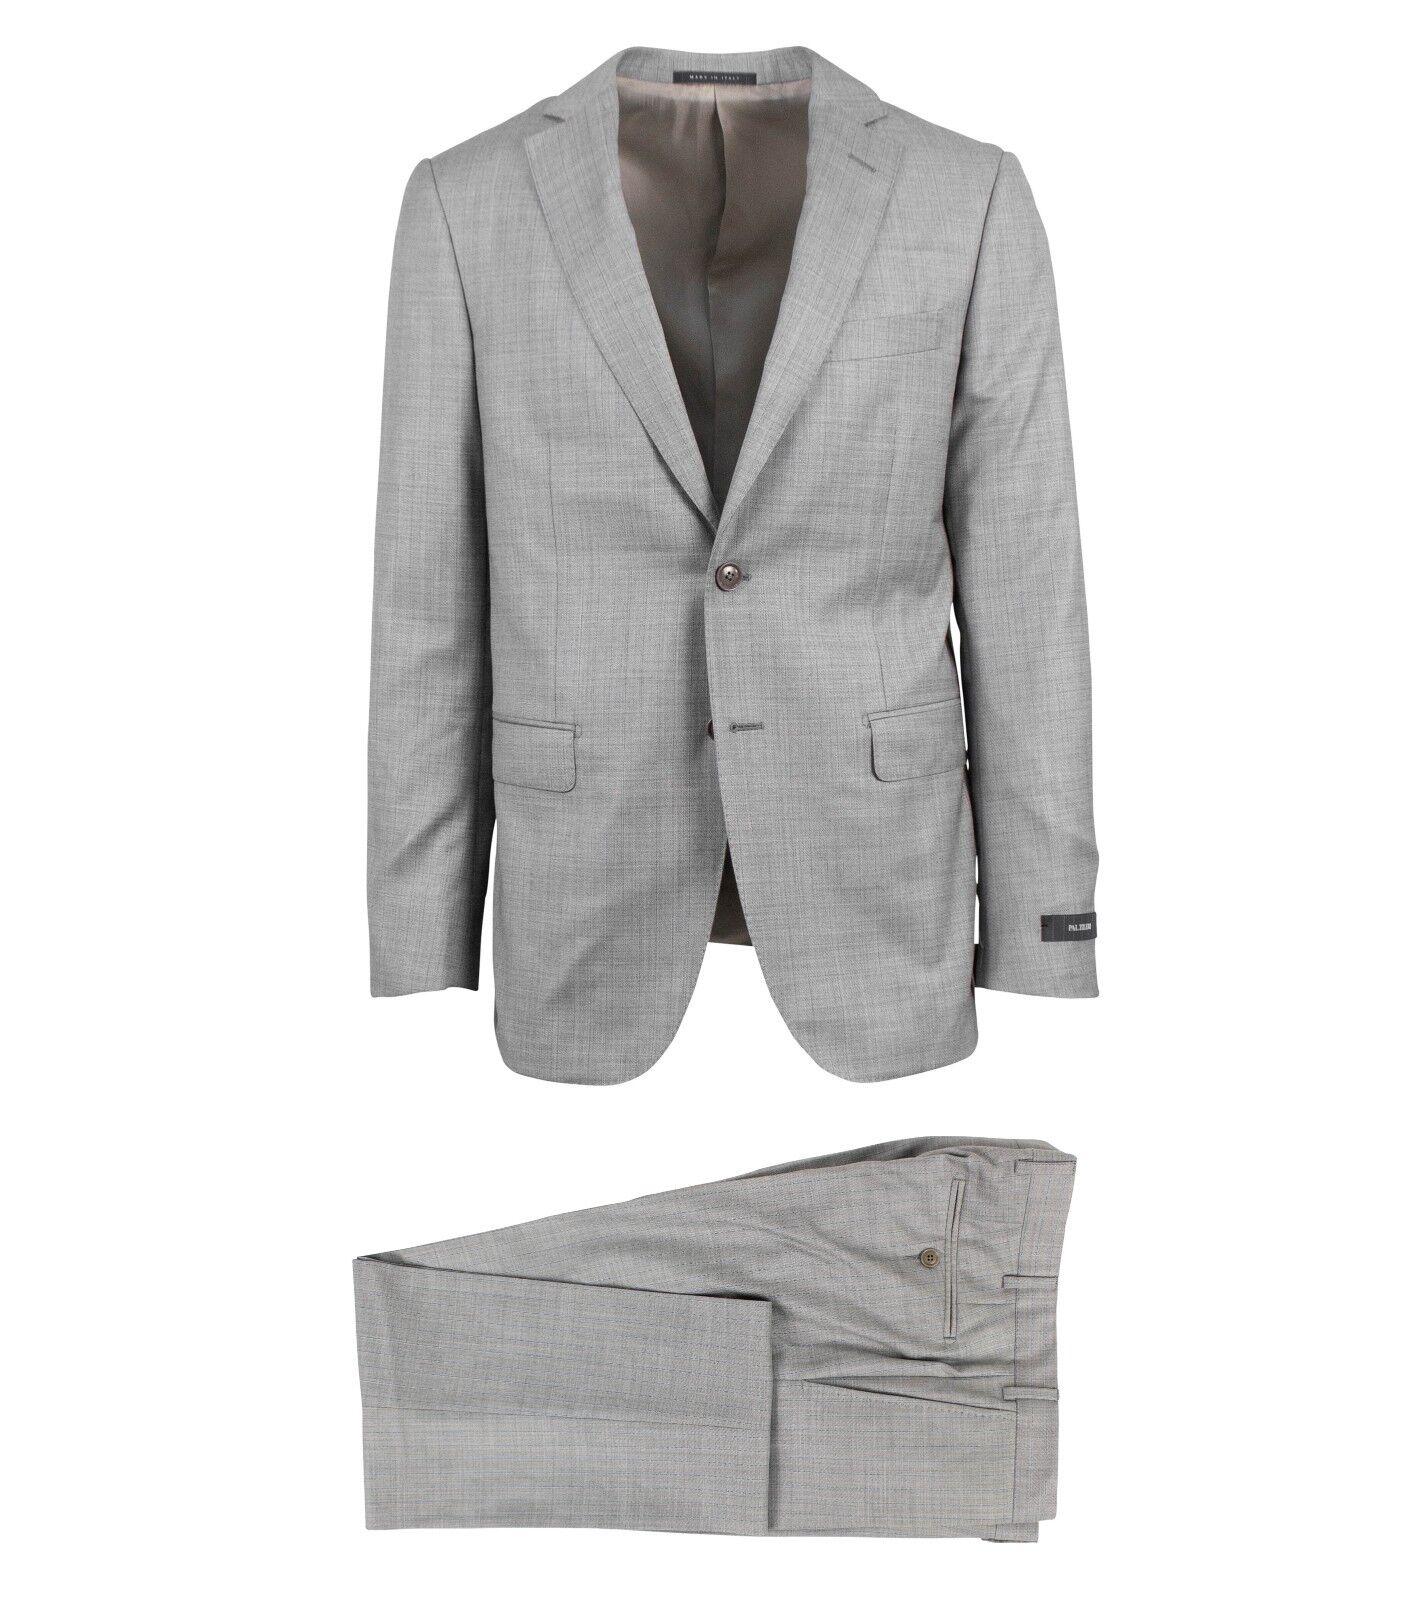 NWT PAL ZILERI grau Stripe Wool Two Button Suit Größe 50/40 R Drop 6